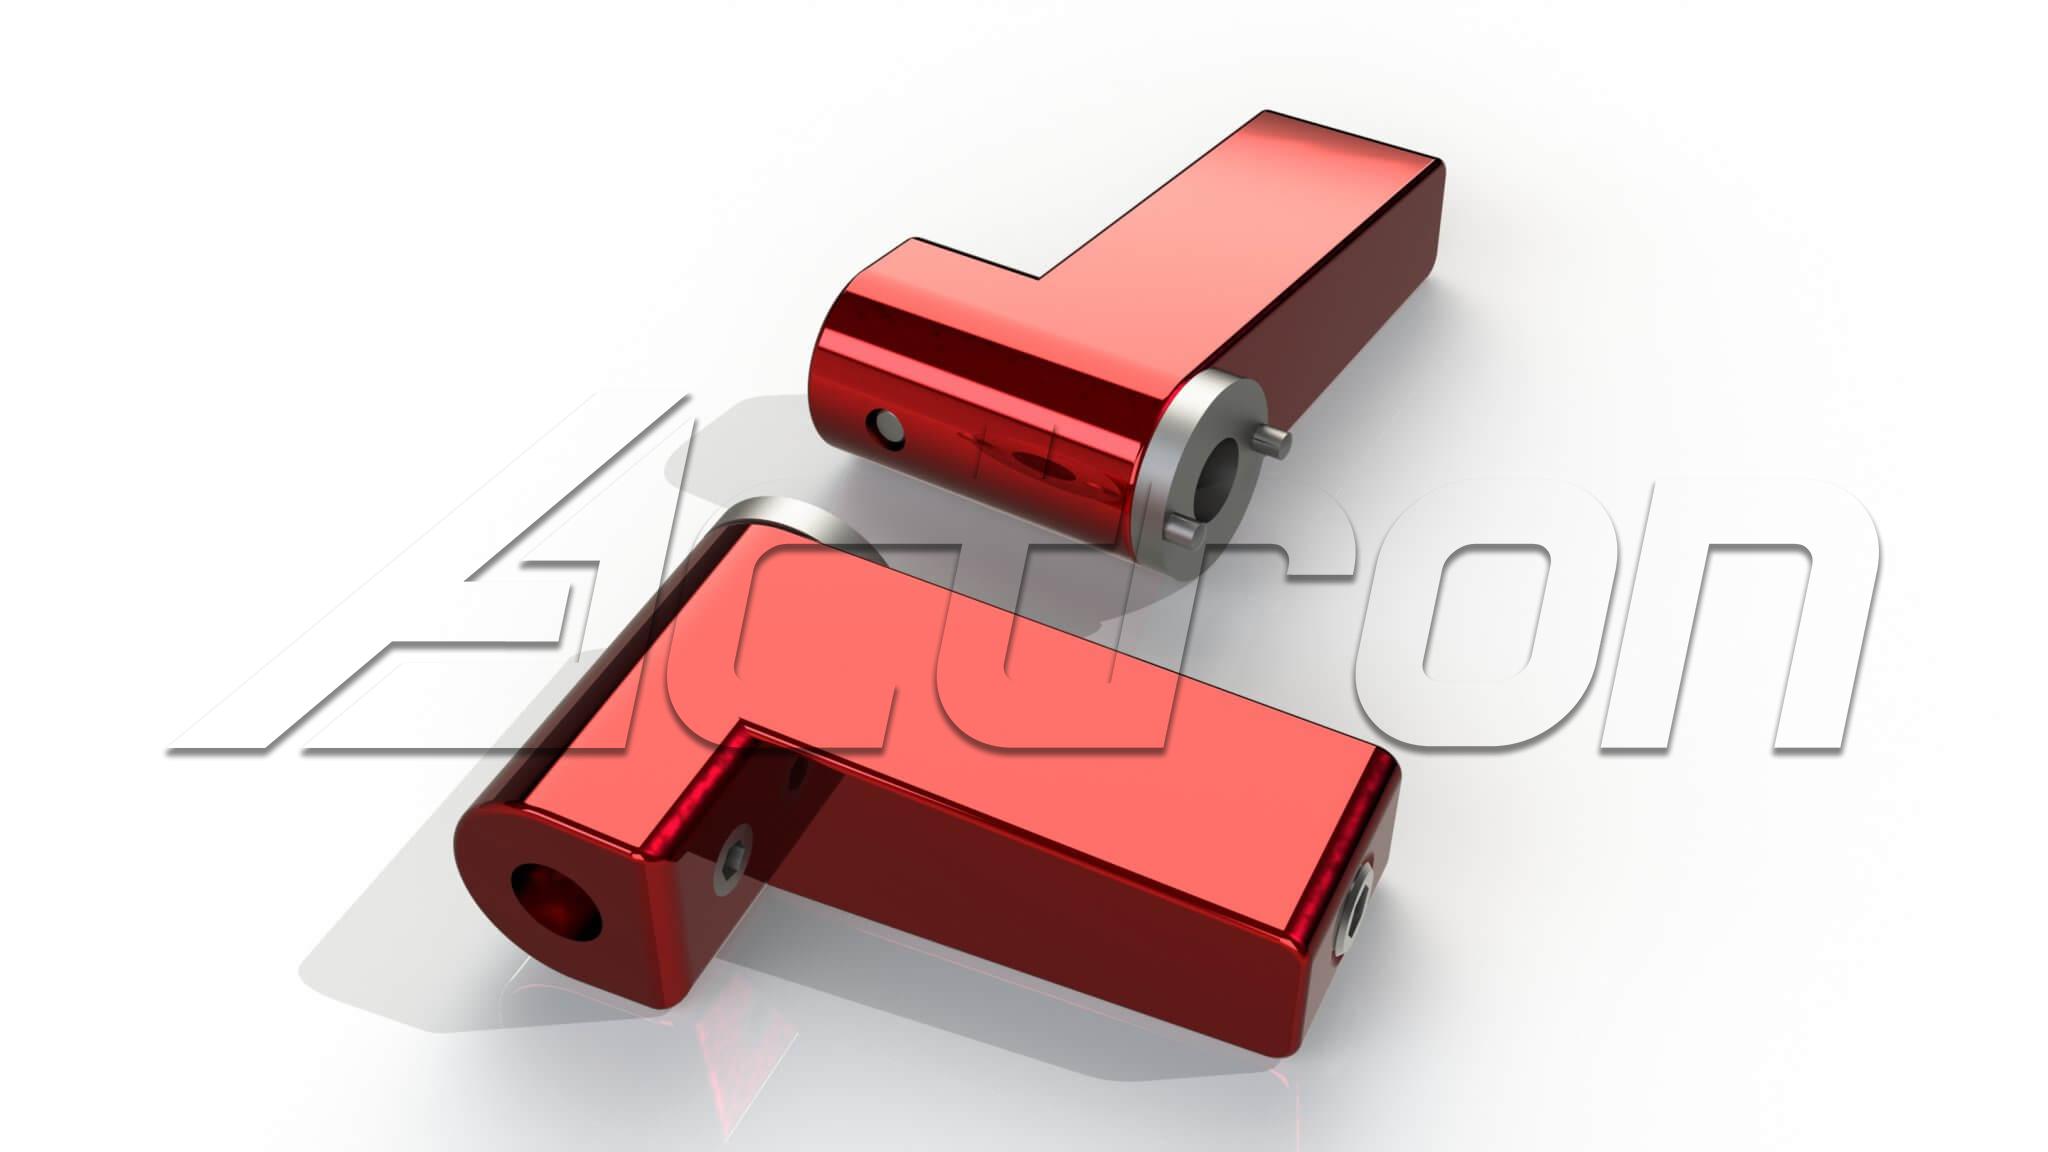 1-4-turn-retainer-4866-a35635.jpg